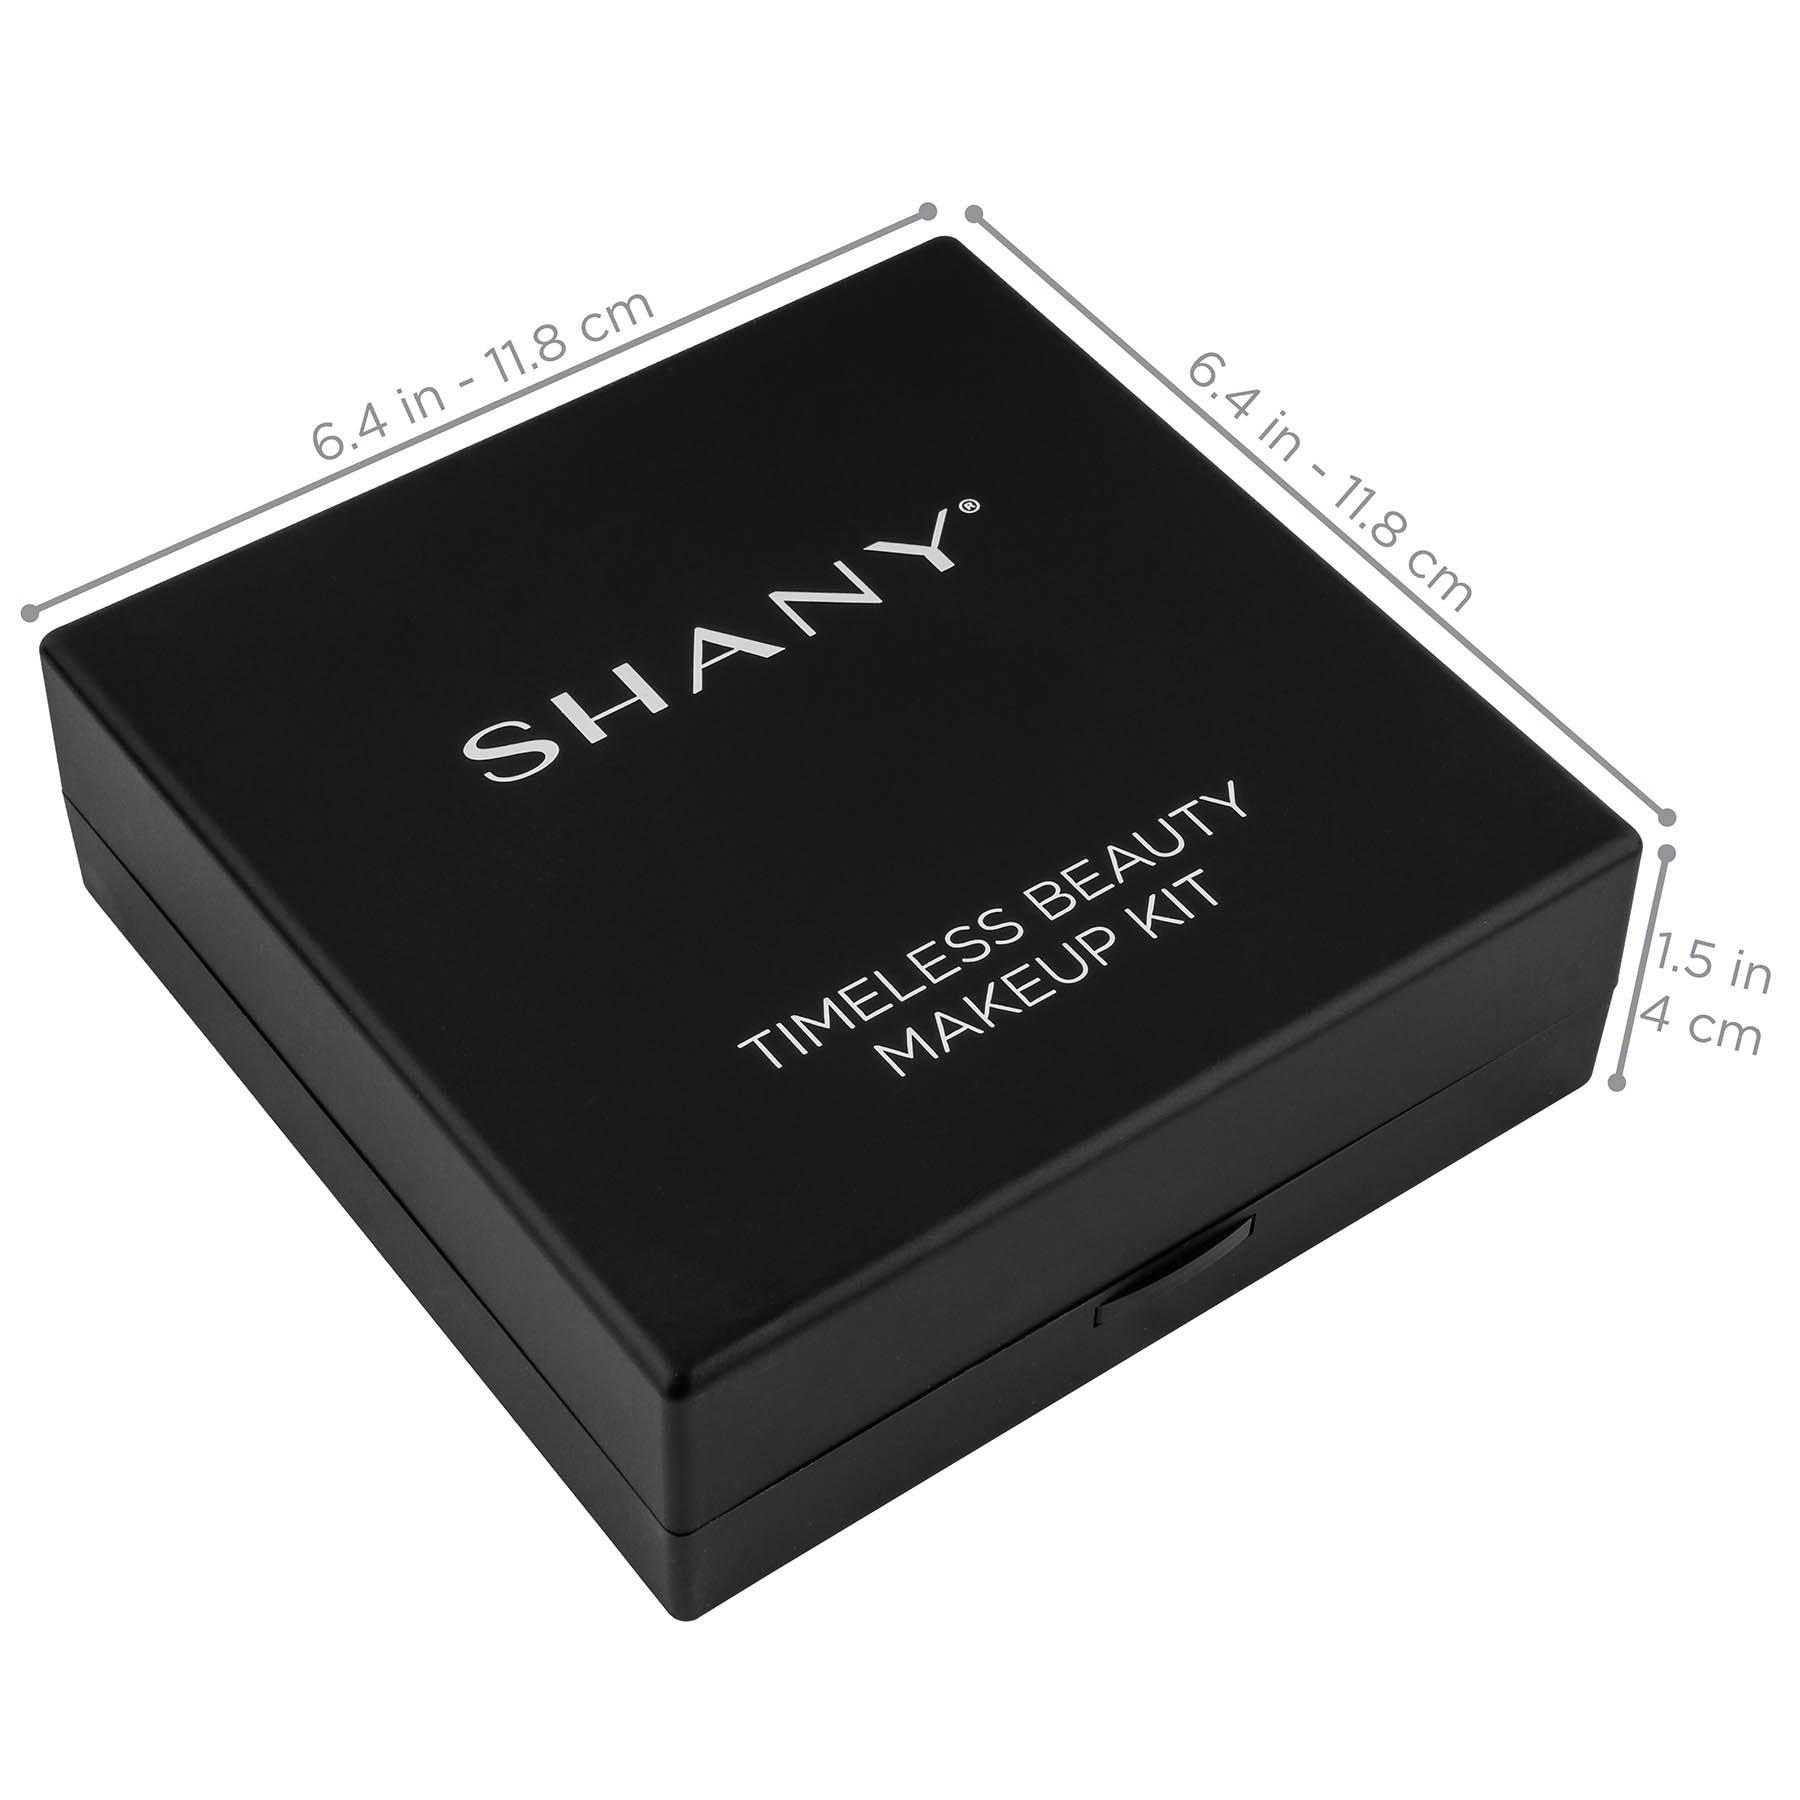 SHANY 'Timeless Beauty' Makeup Kit, Multi by SHANY Cosmetics (Image #4)